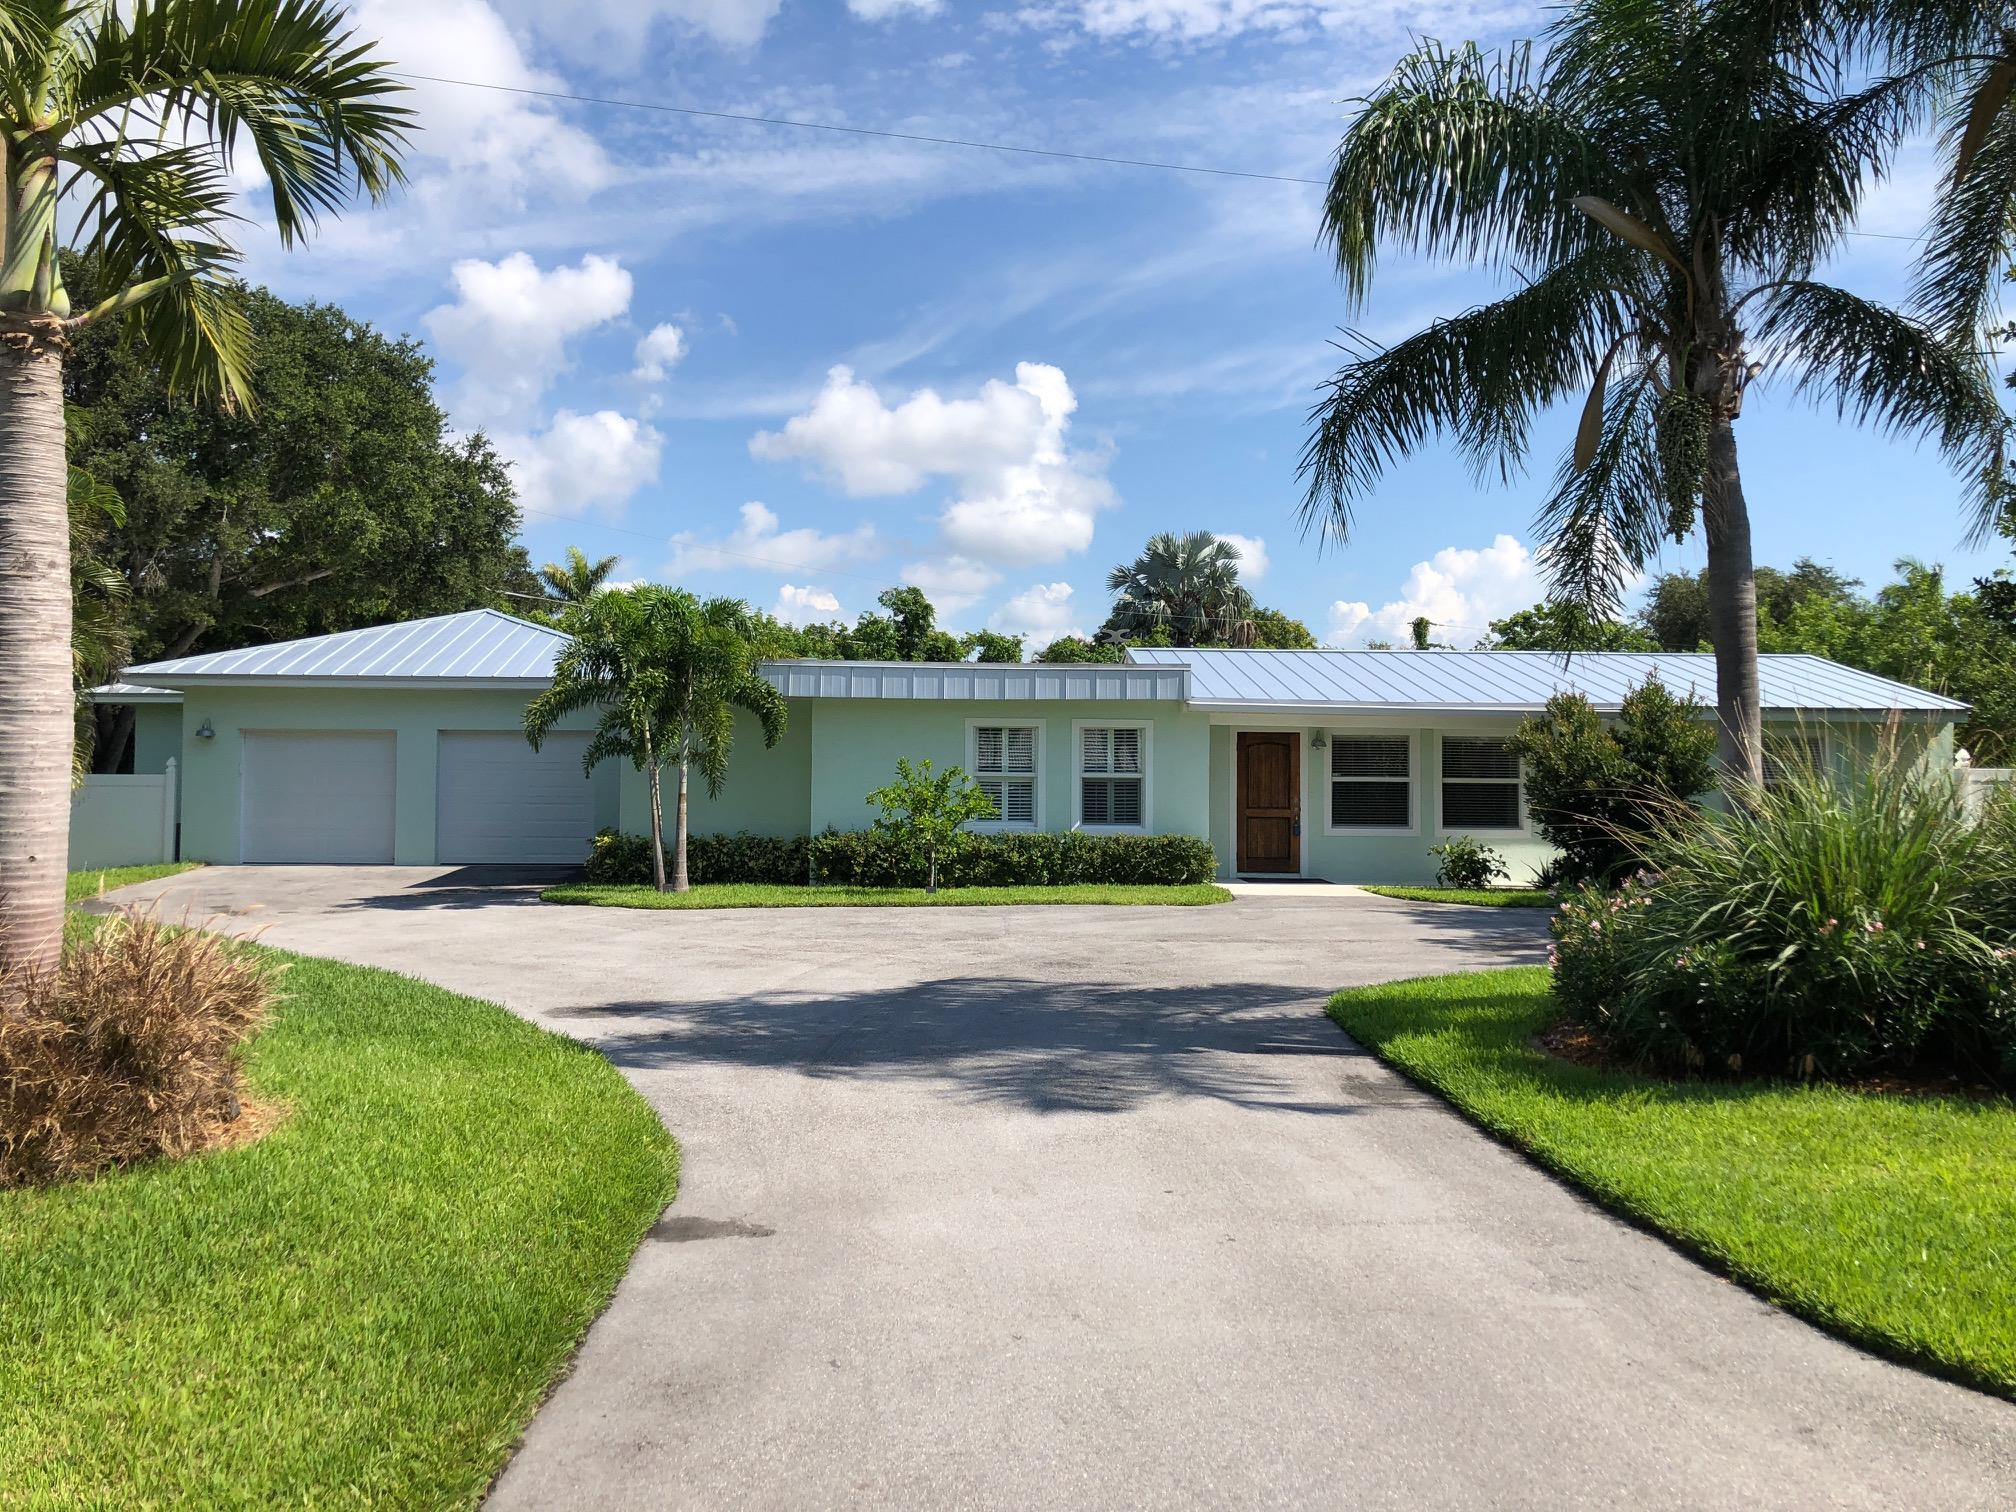 365 NW 35 Street Boca Raton, FL 33431